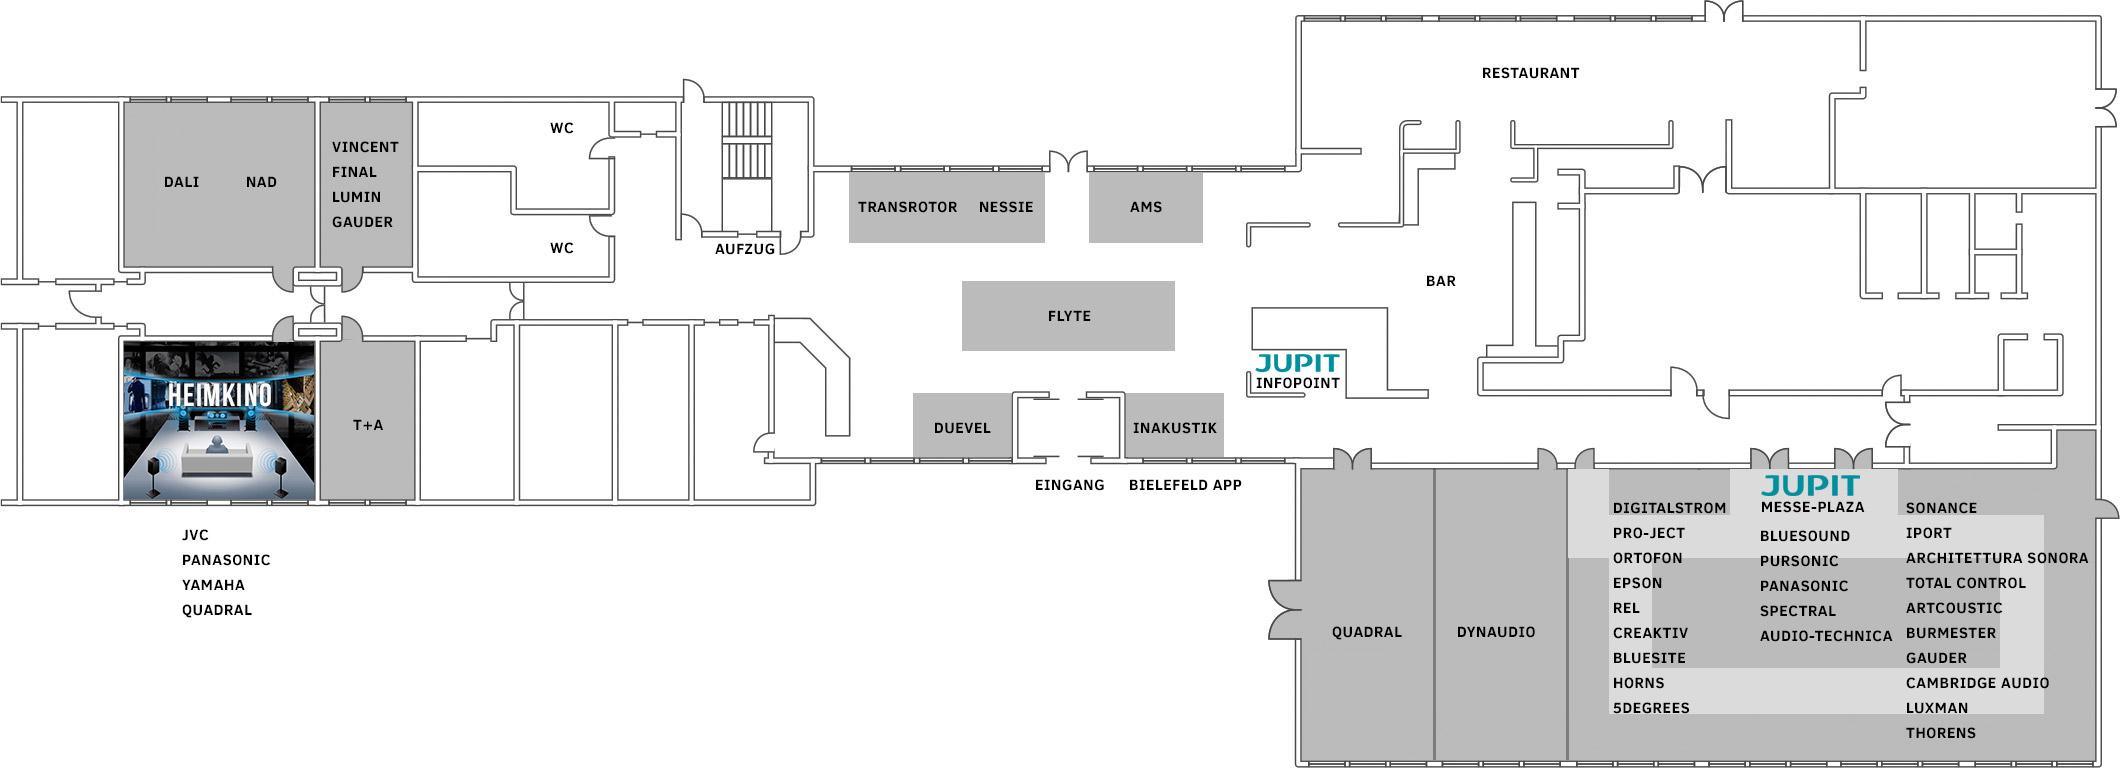 Hotel Mercure Raumplan